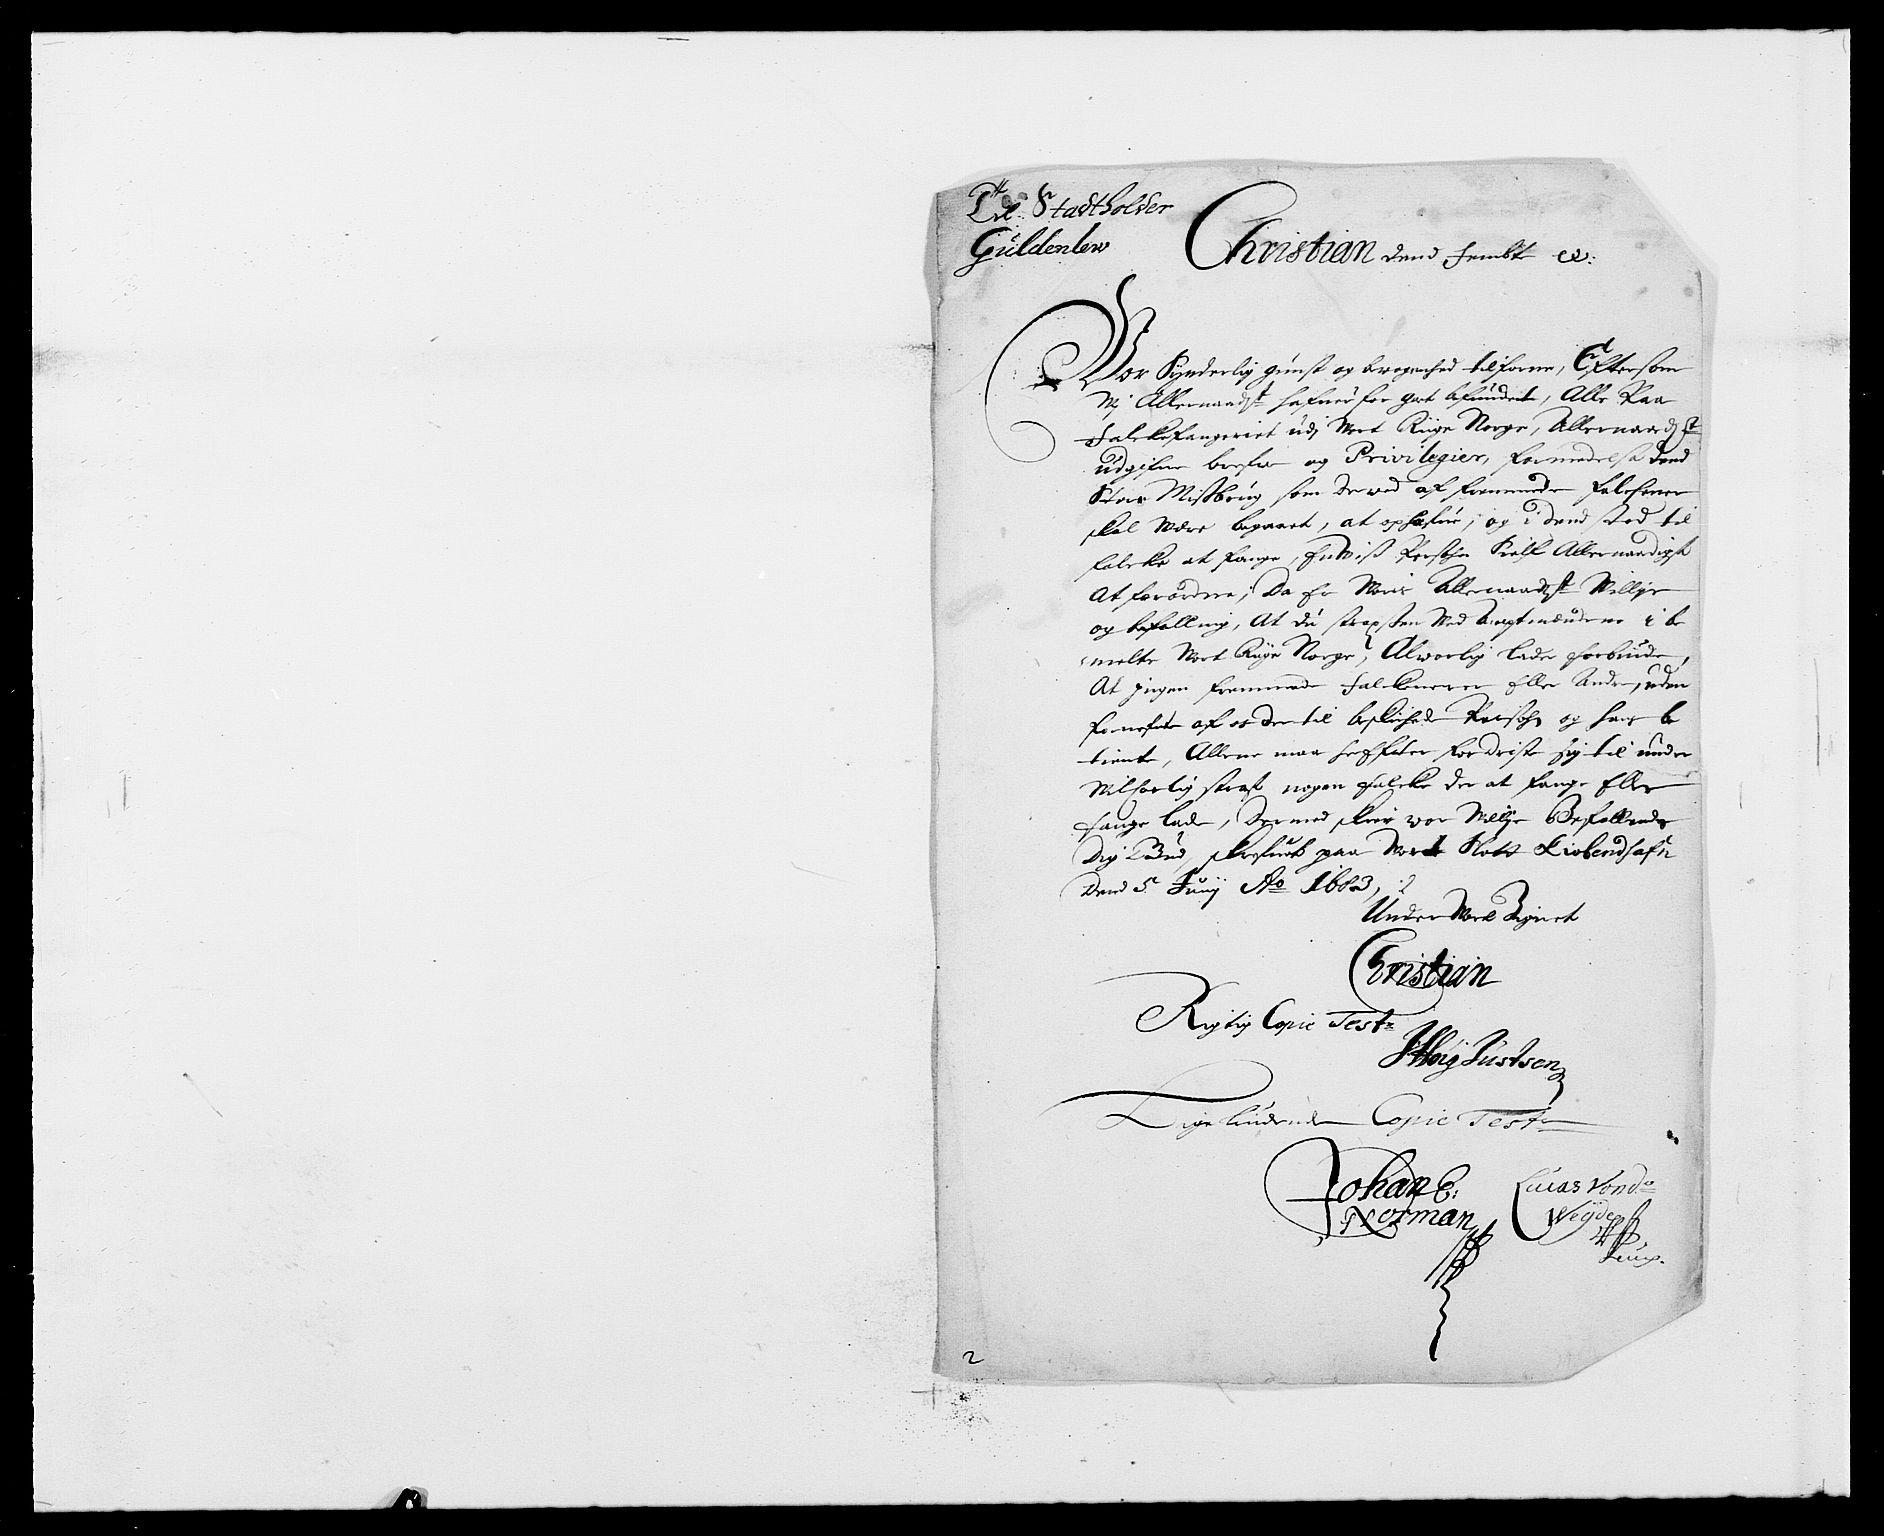 RA, Rentekammeret inntil 1814, Reviderte regnskaper, Fogderegnskap, R41/L2532: Fogderegnskap Lista, 1683, s. 169